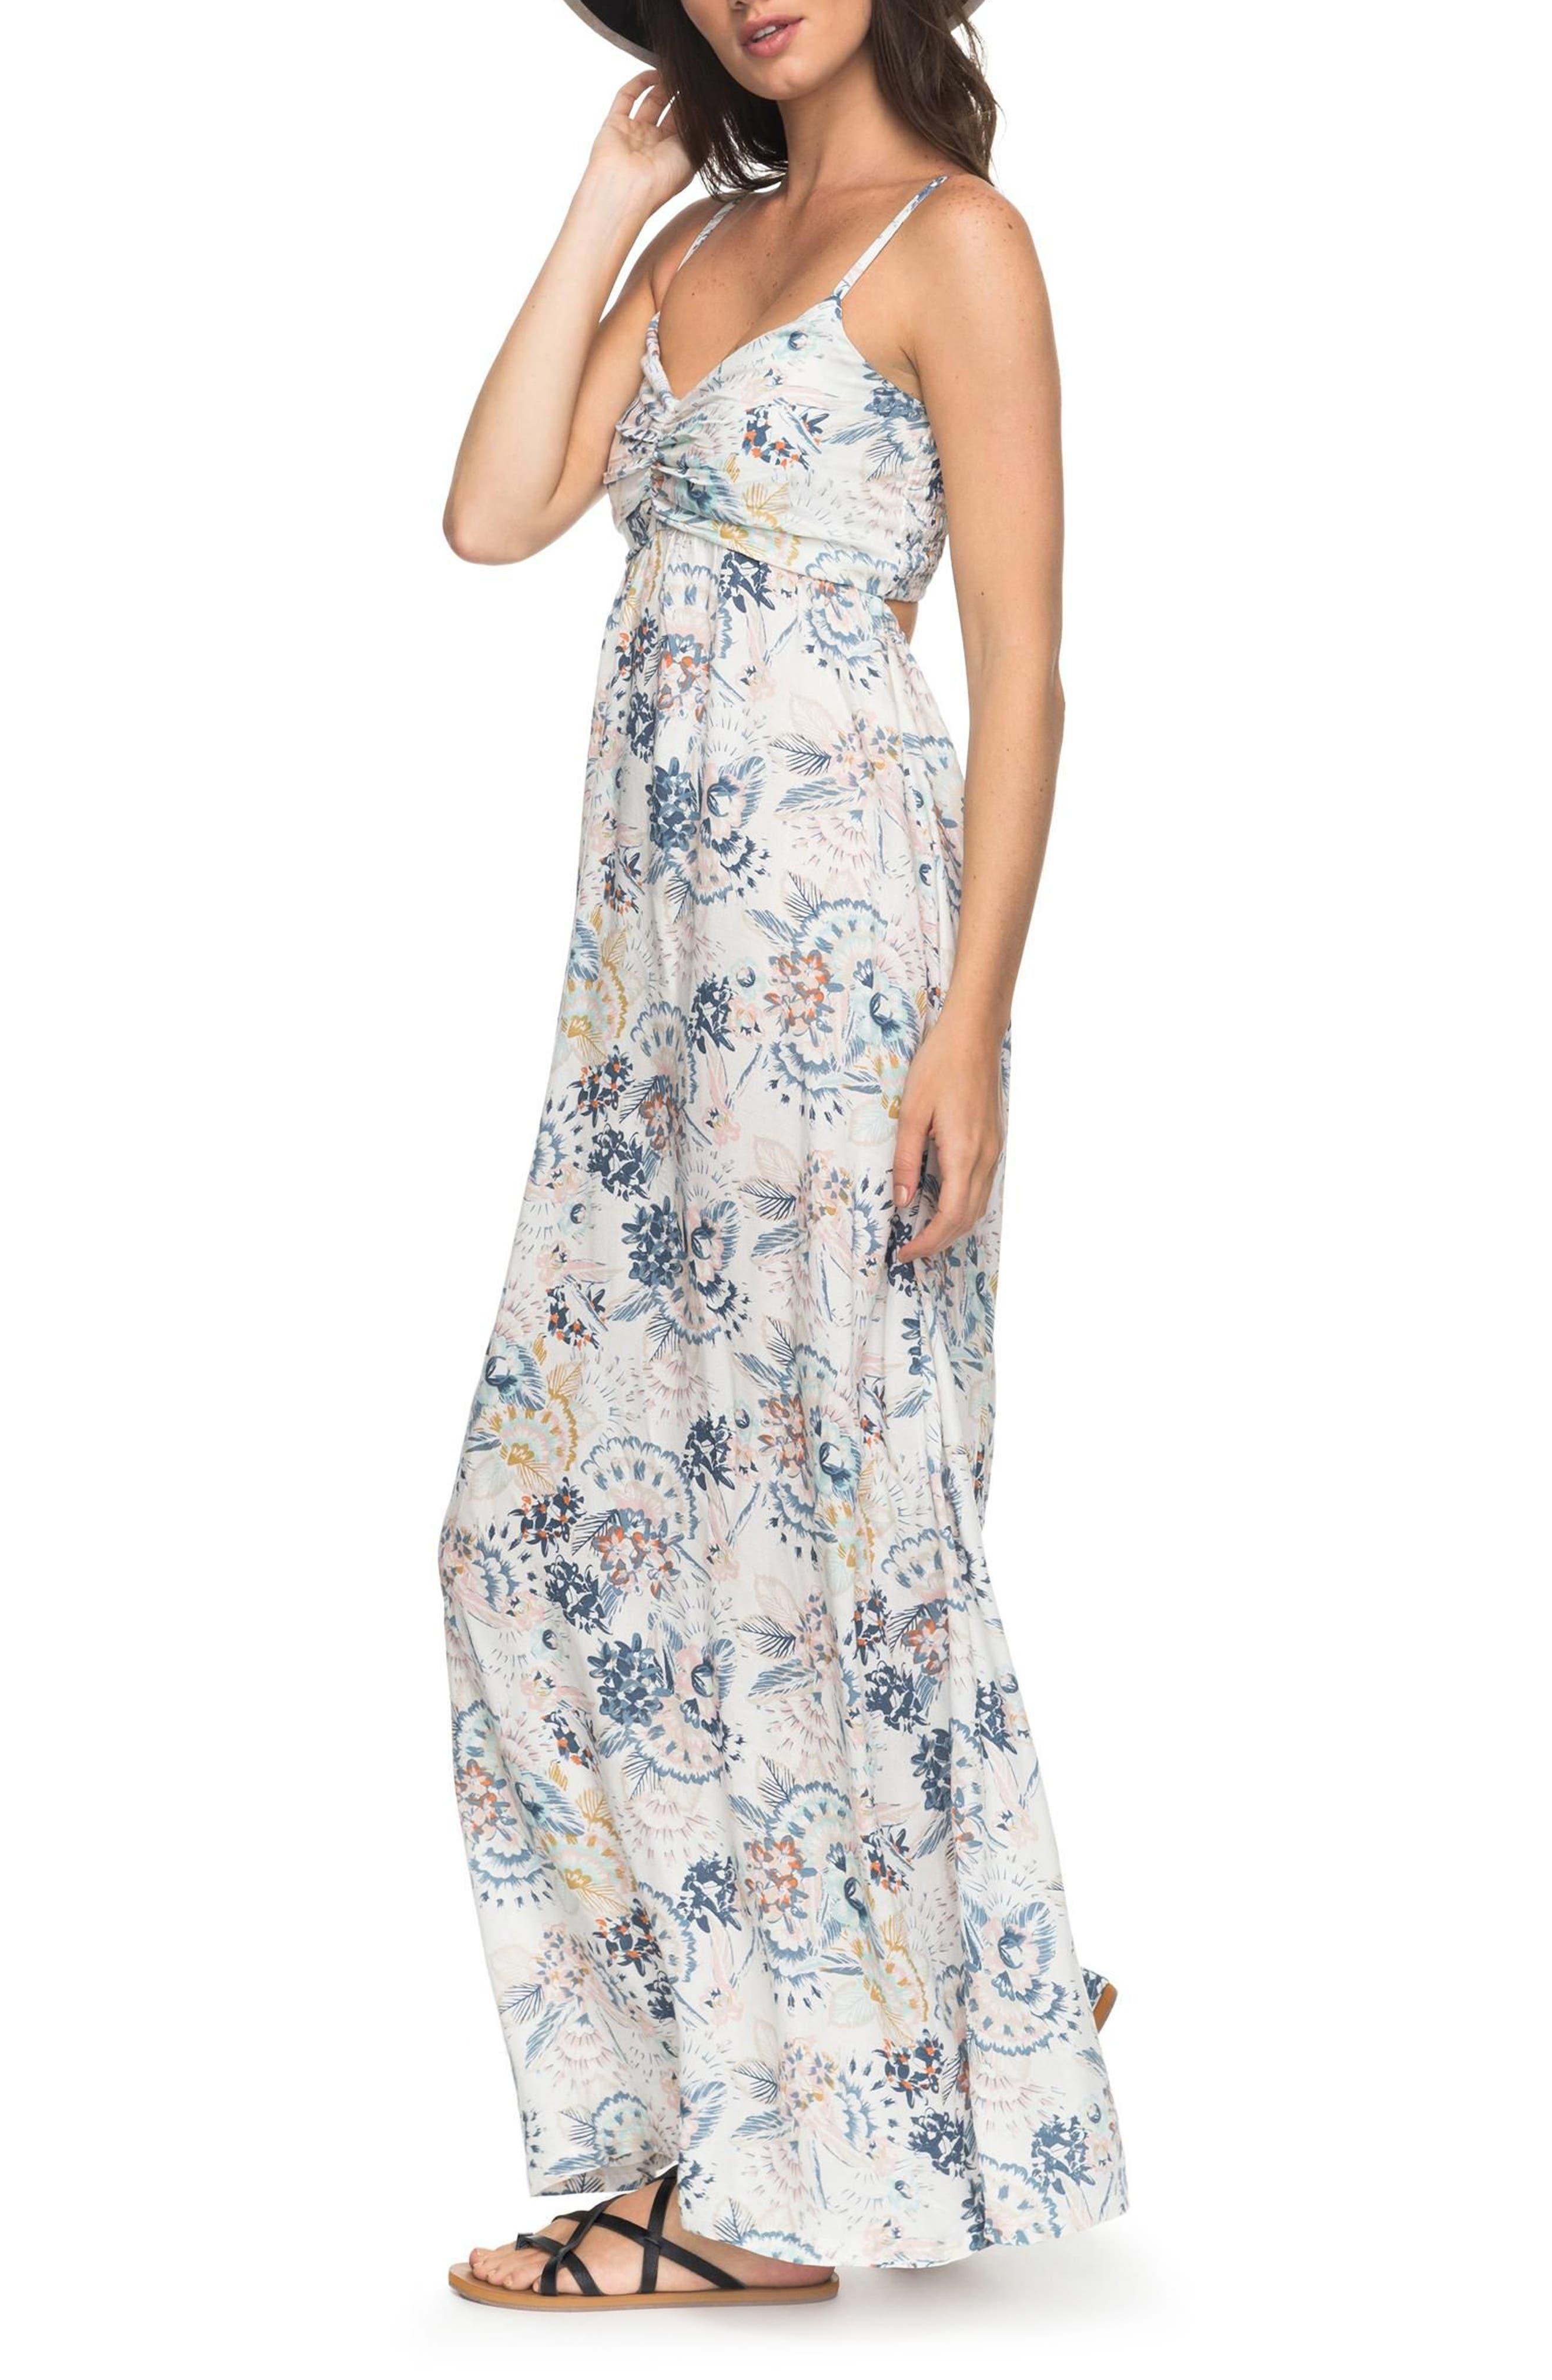 ROXY,                             Brilliant Stars Maxi Dress,                             Alternate thumbnail 3, color,                             900